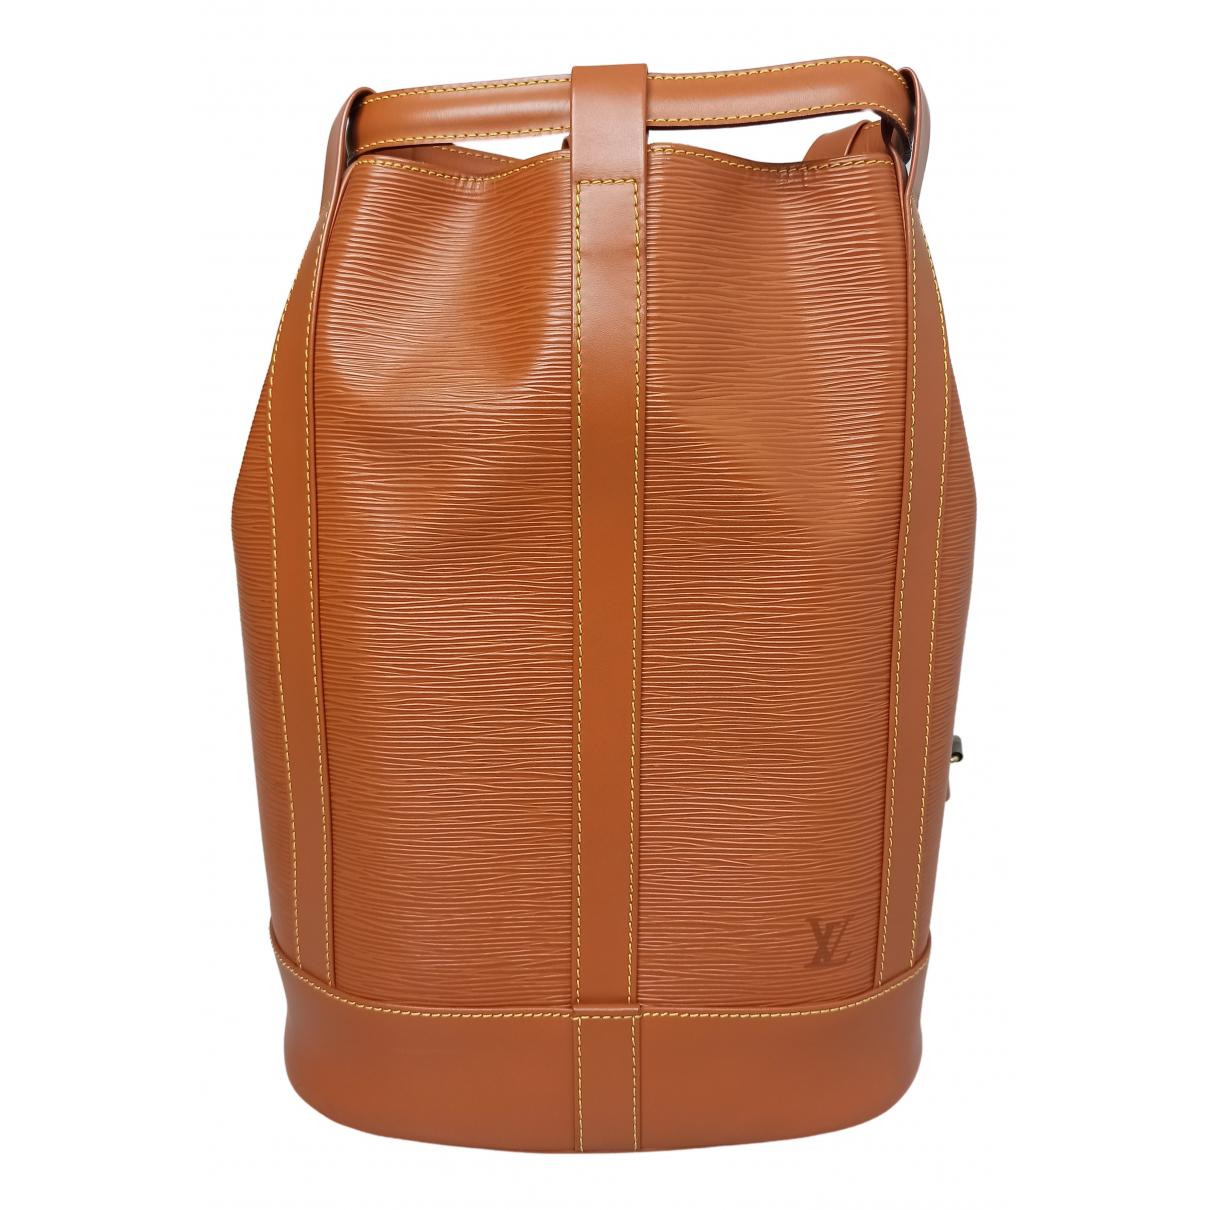 Louis Vuitton - Sac a dos Randonnee pour femme en cuir